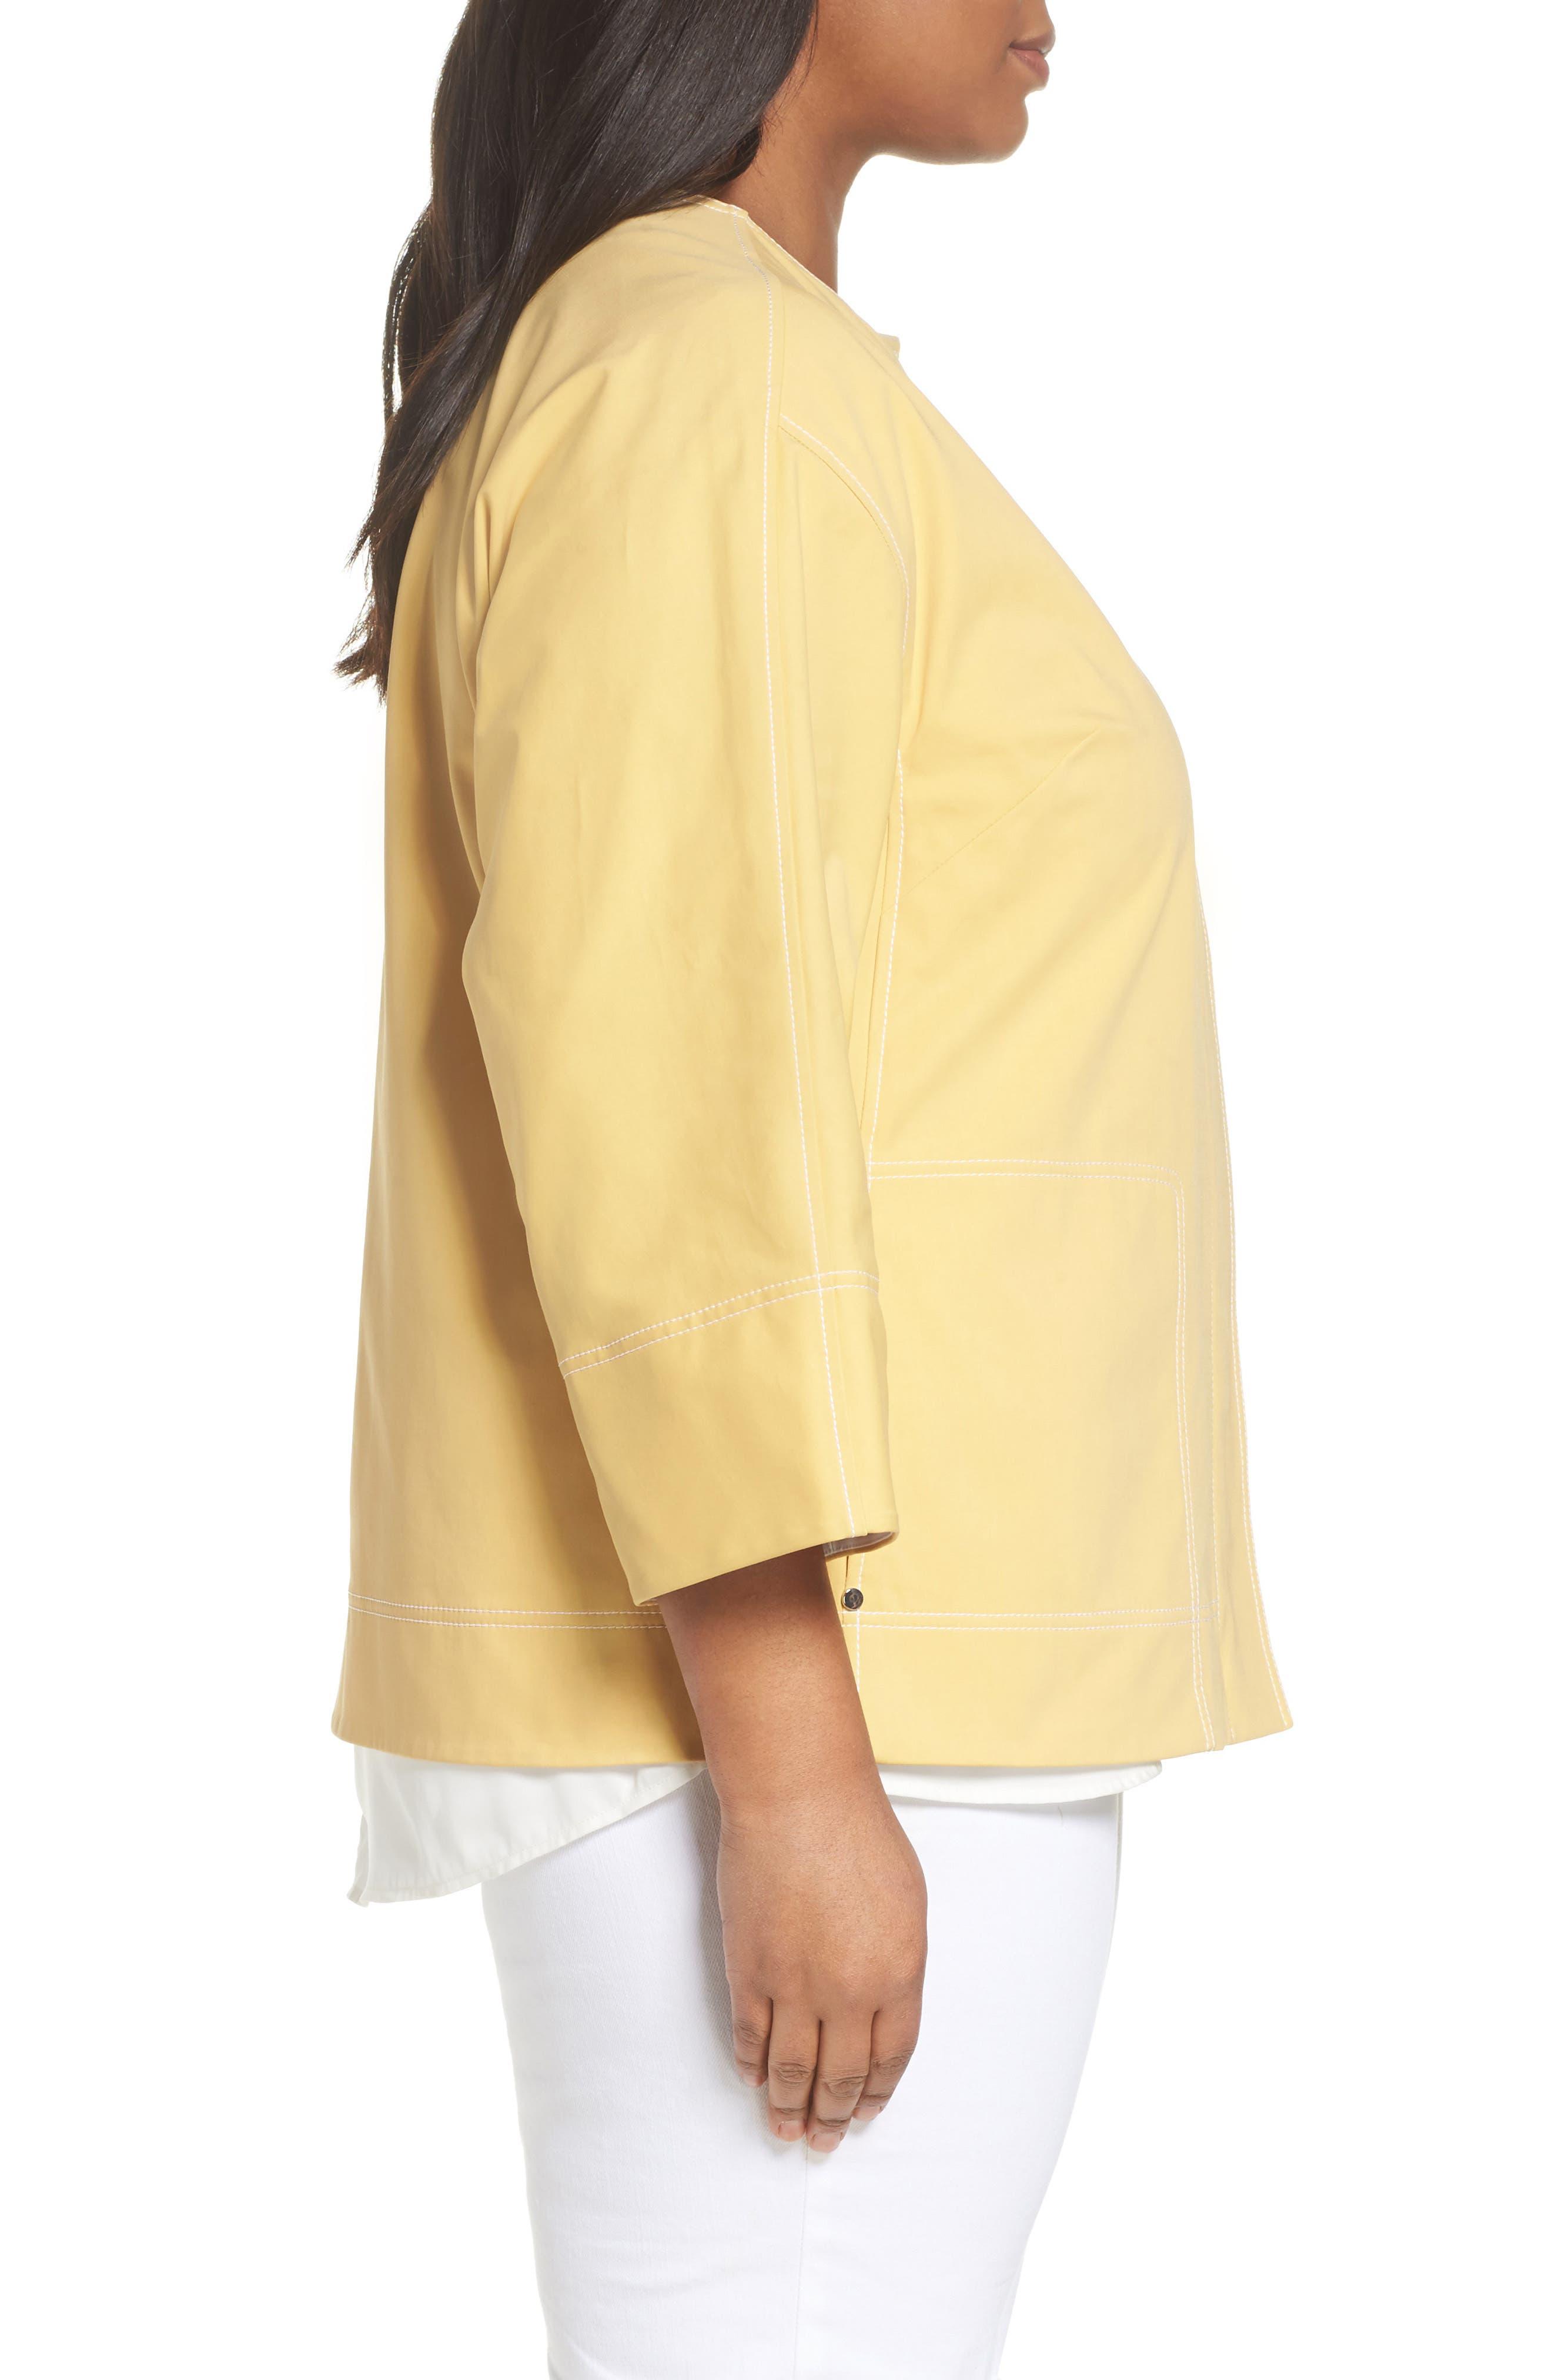 Milo Zip Jacket,                             Alternate thumbnail 3, color,                             Sienna Yellow